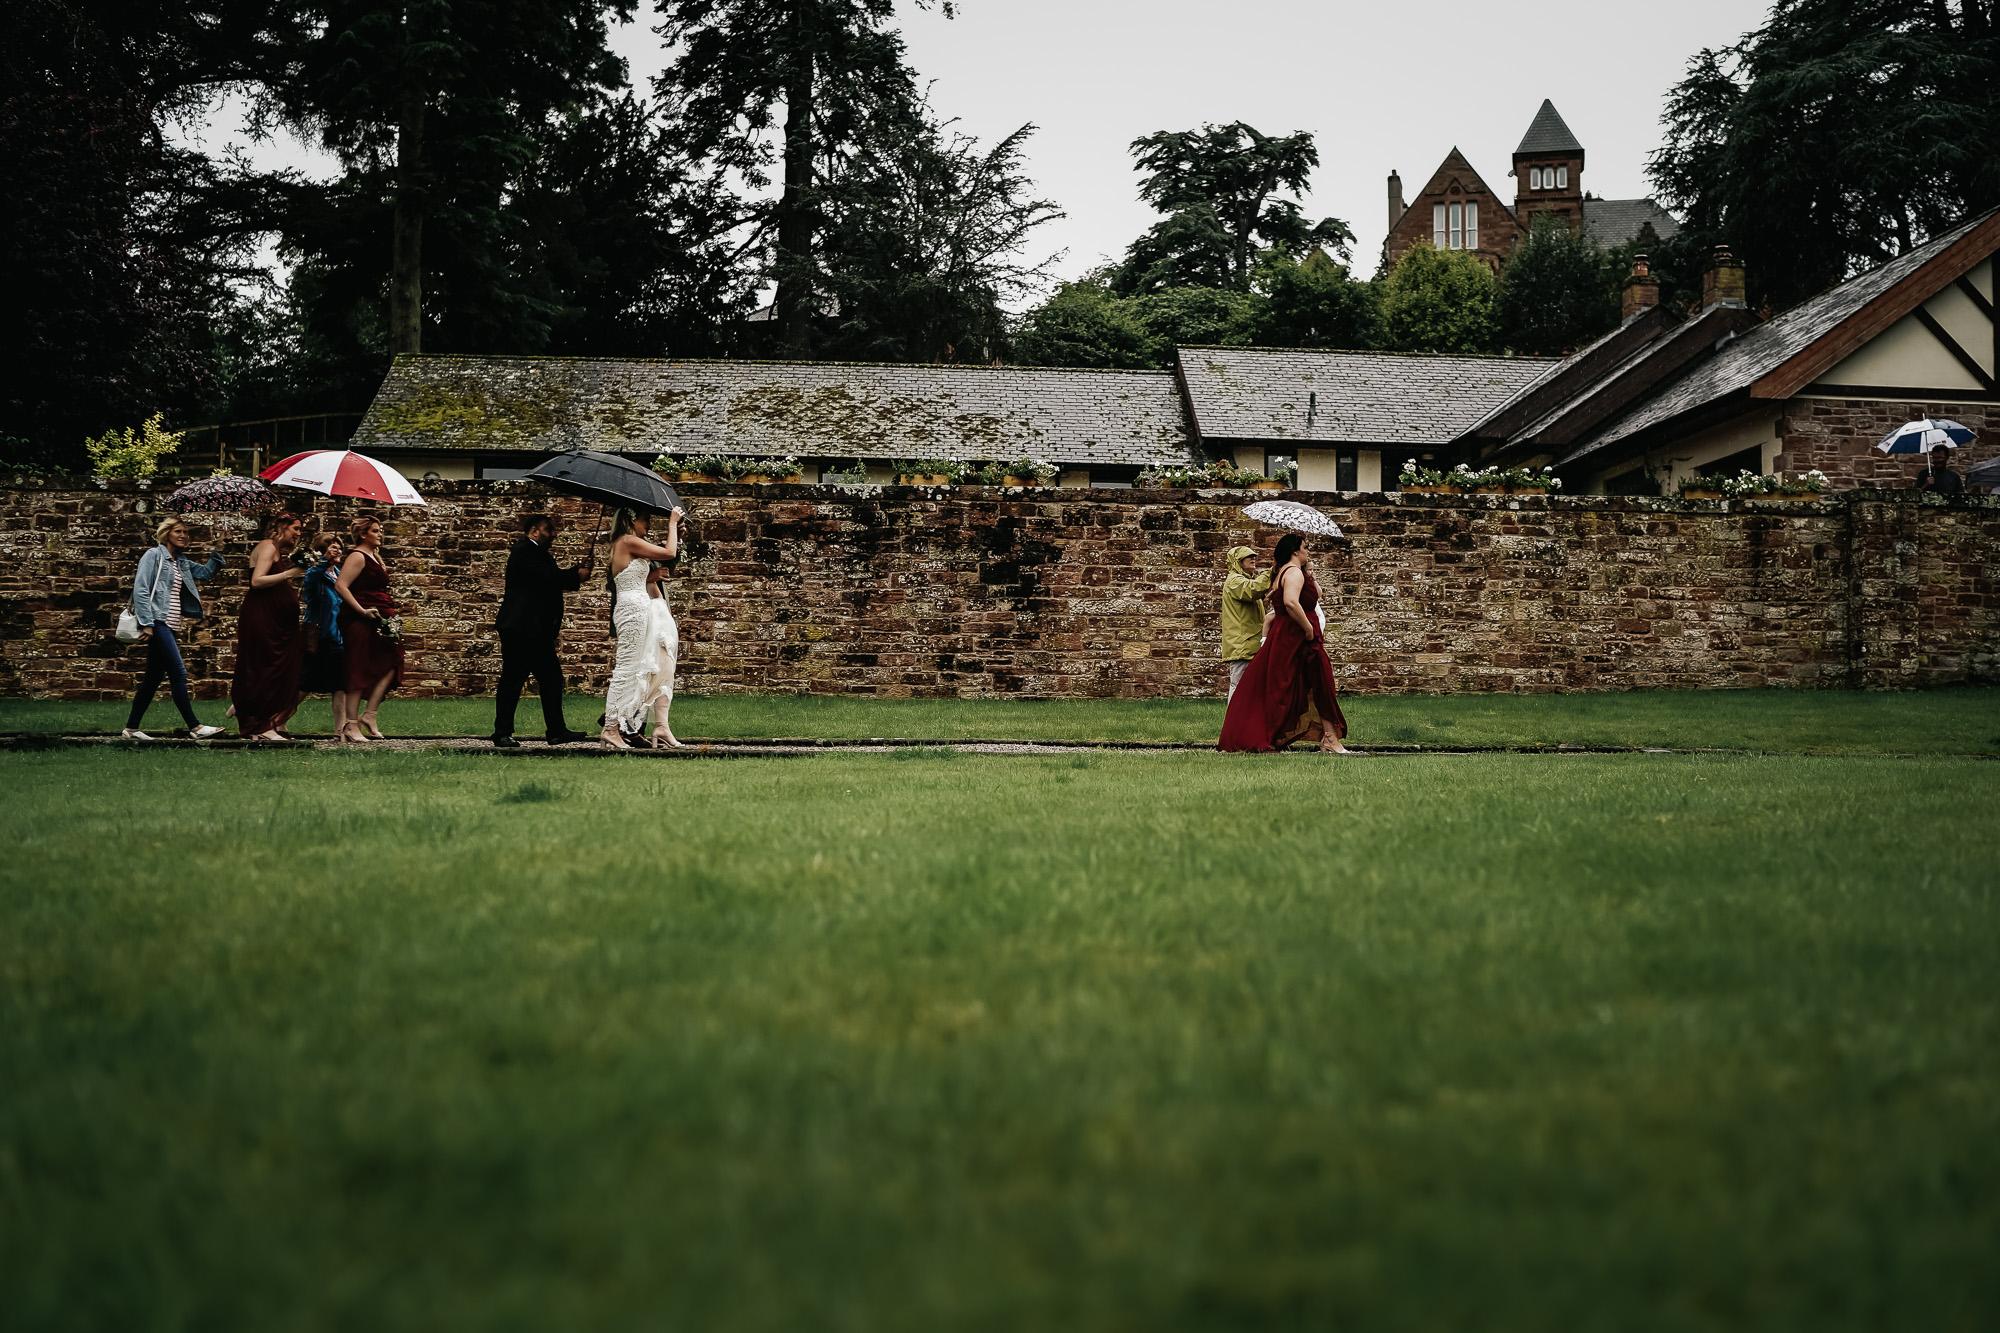 High Barn Wedding photographer lake distect penrith documentry wedding photography (22 of 57).jpg